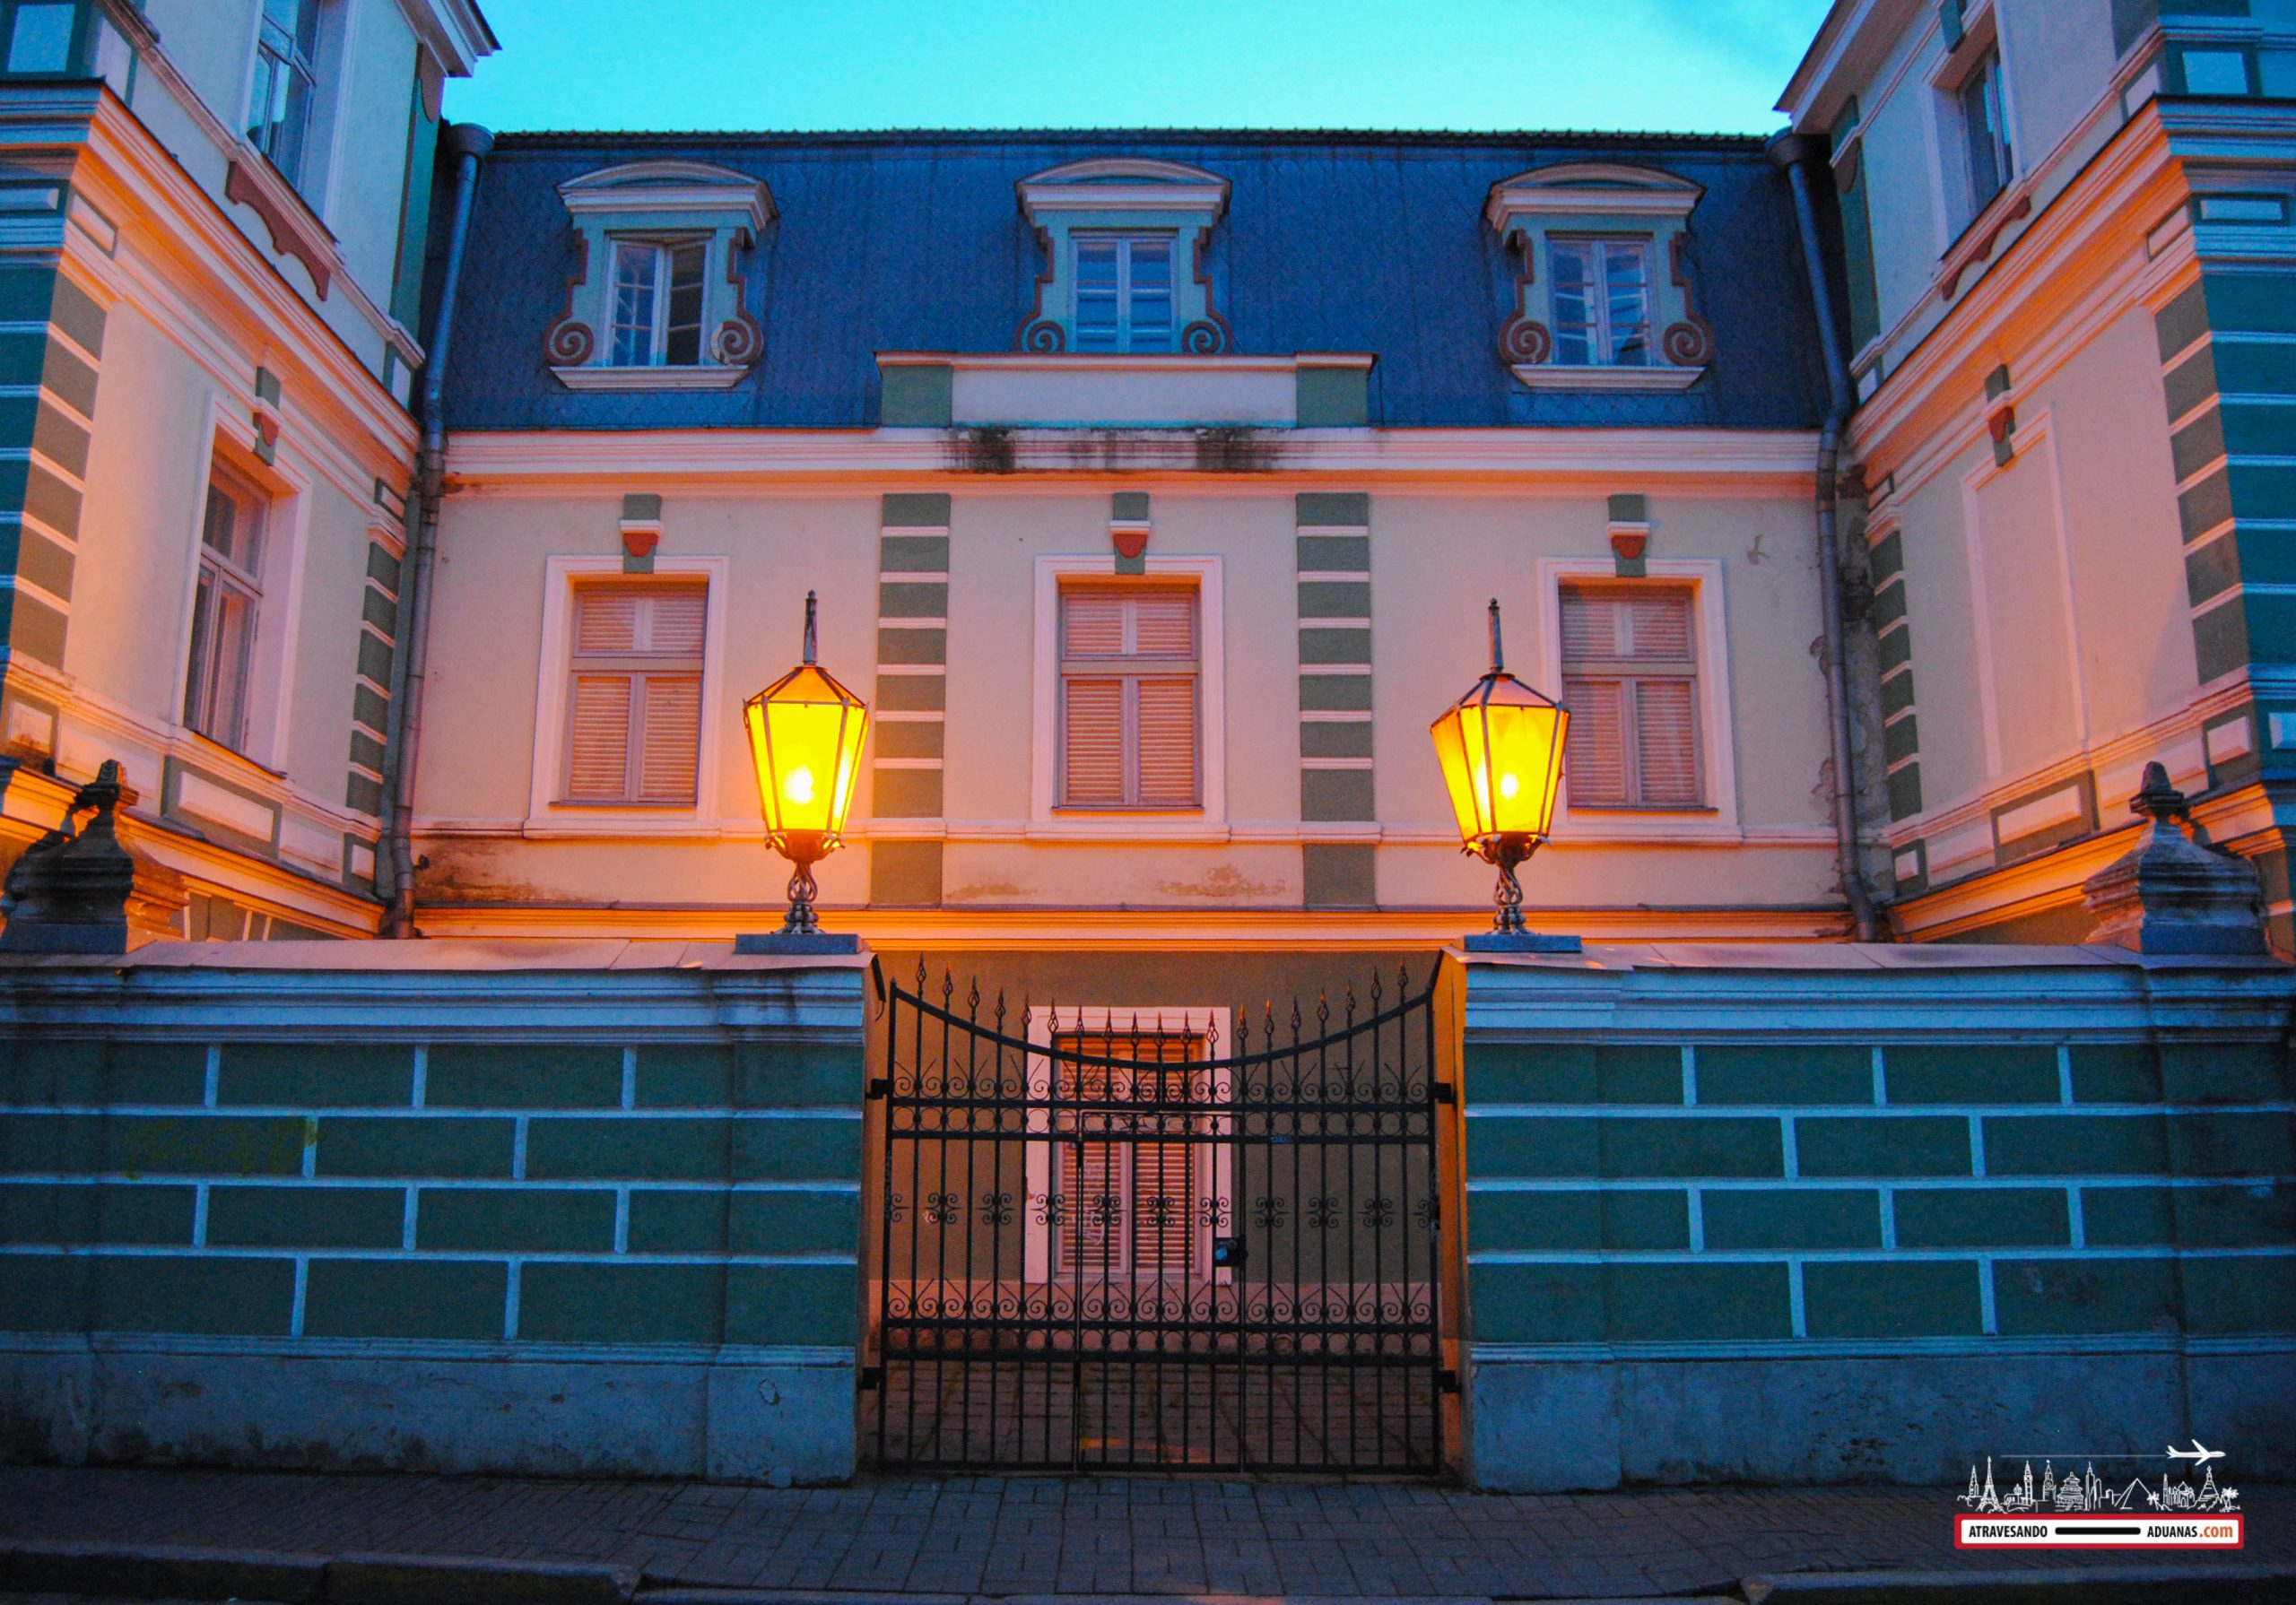 Casita en Tallinn al caer la noche